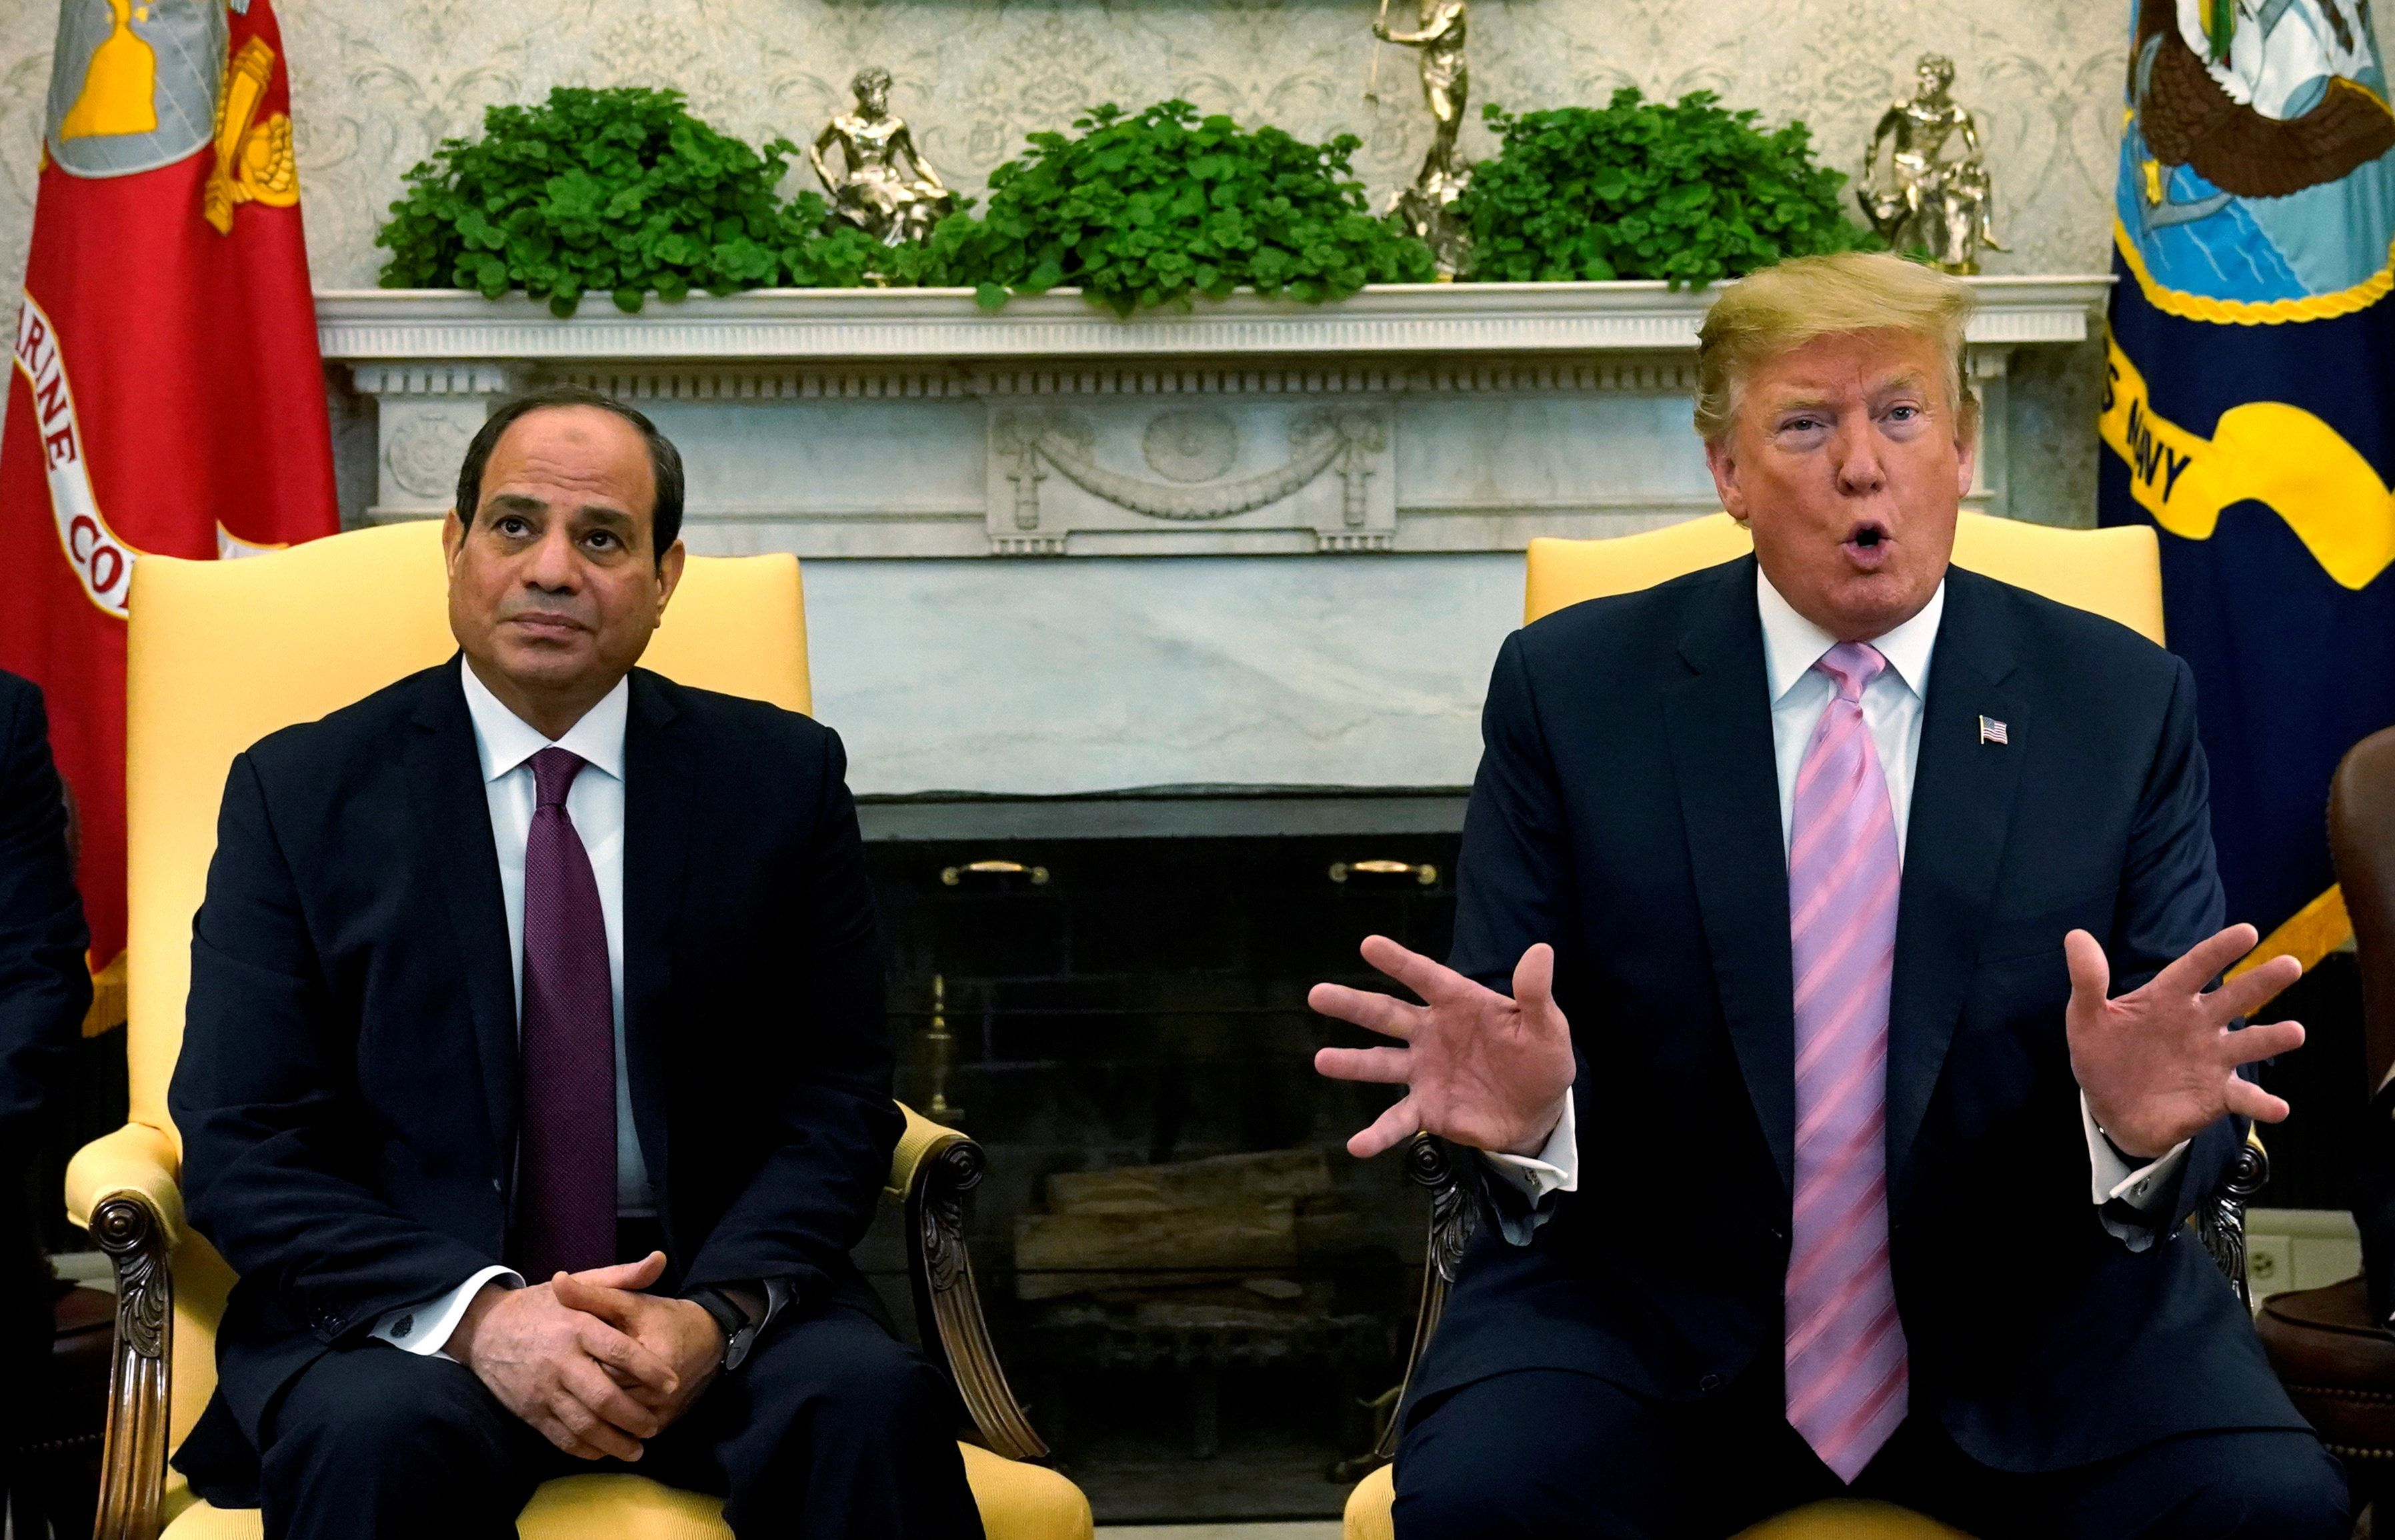 Bro! Trump Goes After The Muslim Brotherhood